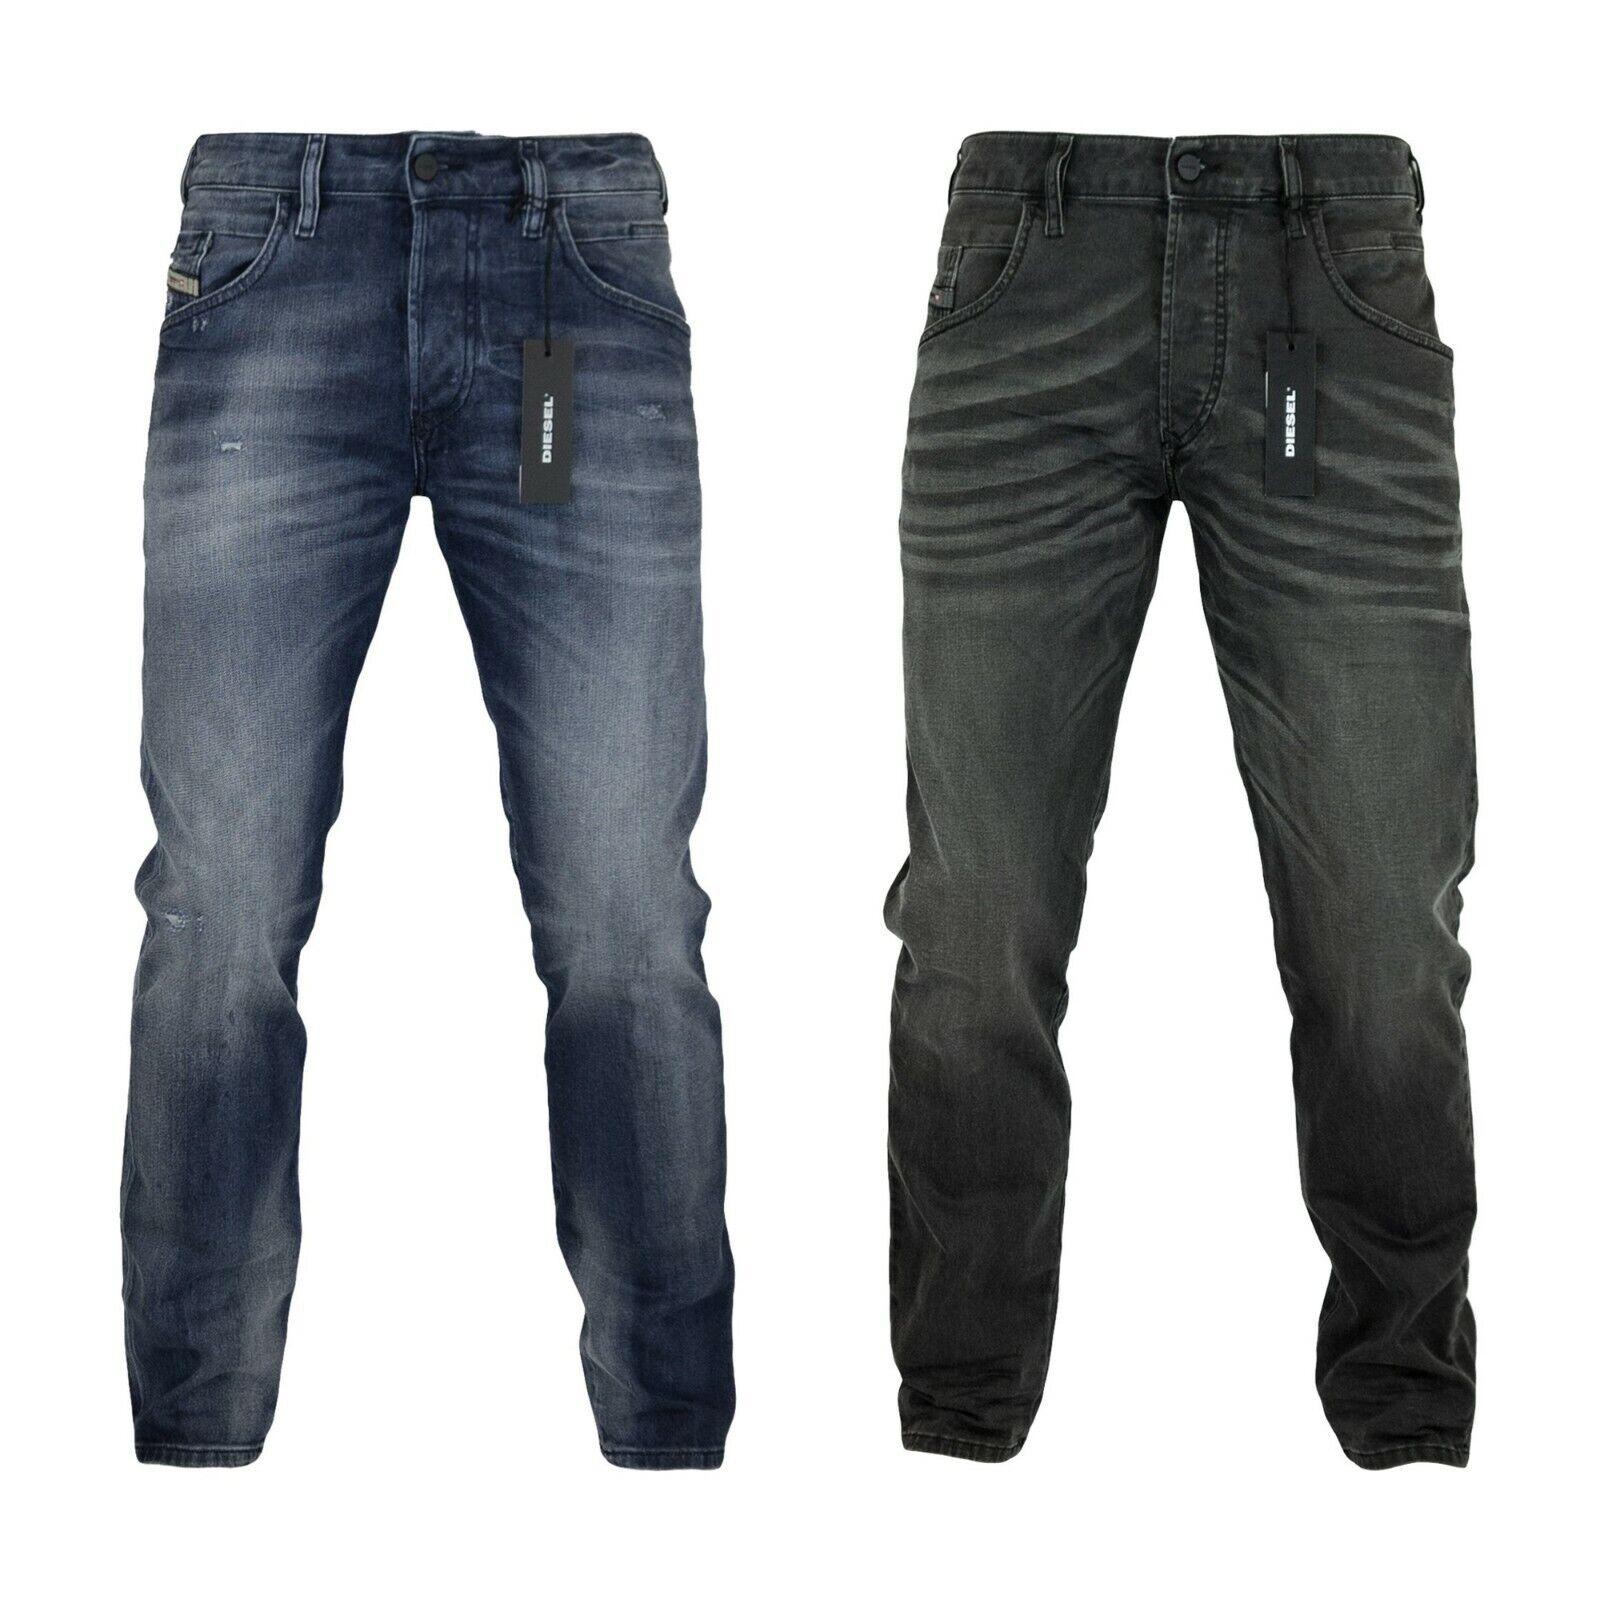 555143b6 Diesel Jeans - Mens Diesel Tapered Fit Denim Jeans 0699P, 084DD - BNWT  D-Bazer - nydrdp8588-Jeans